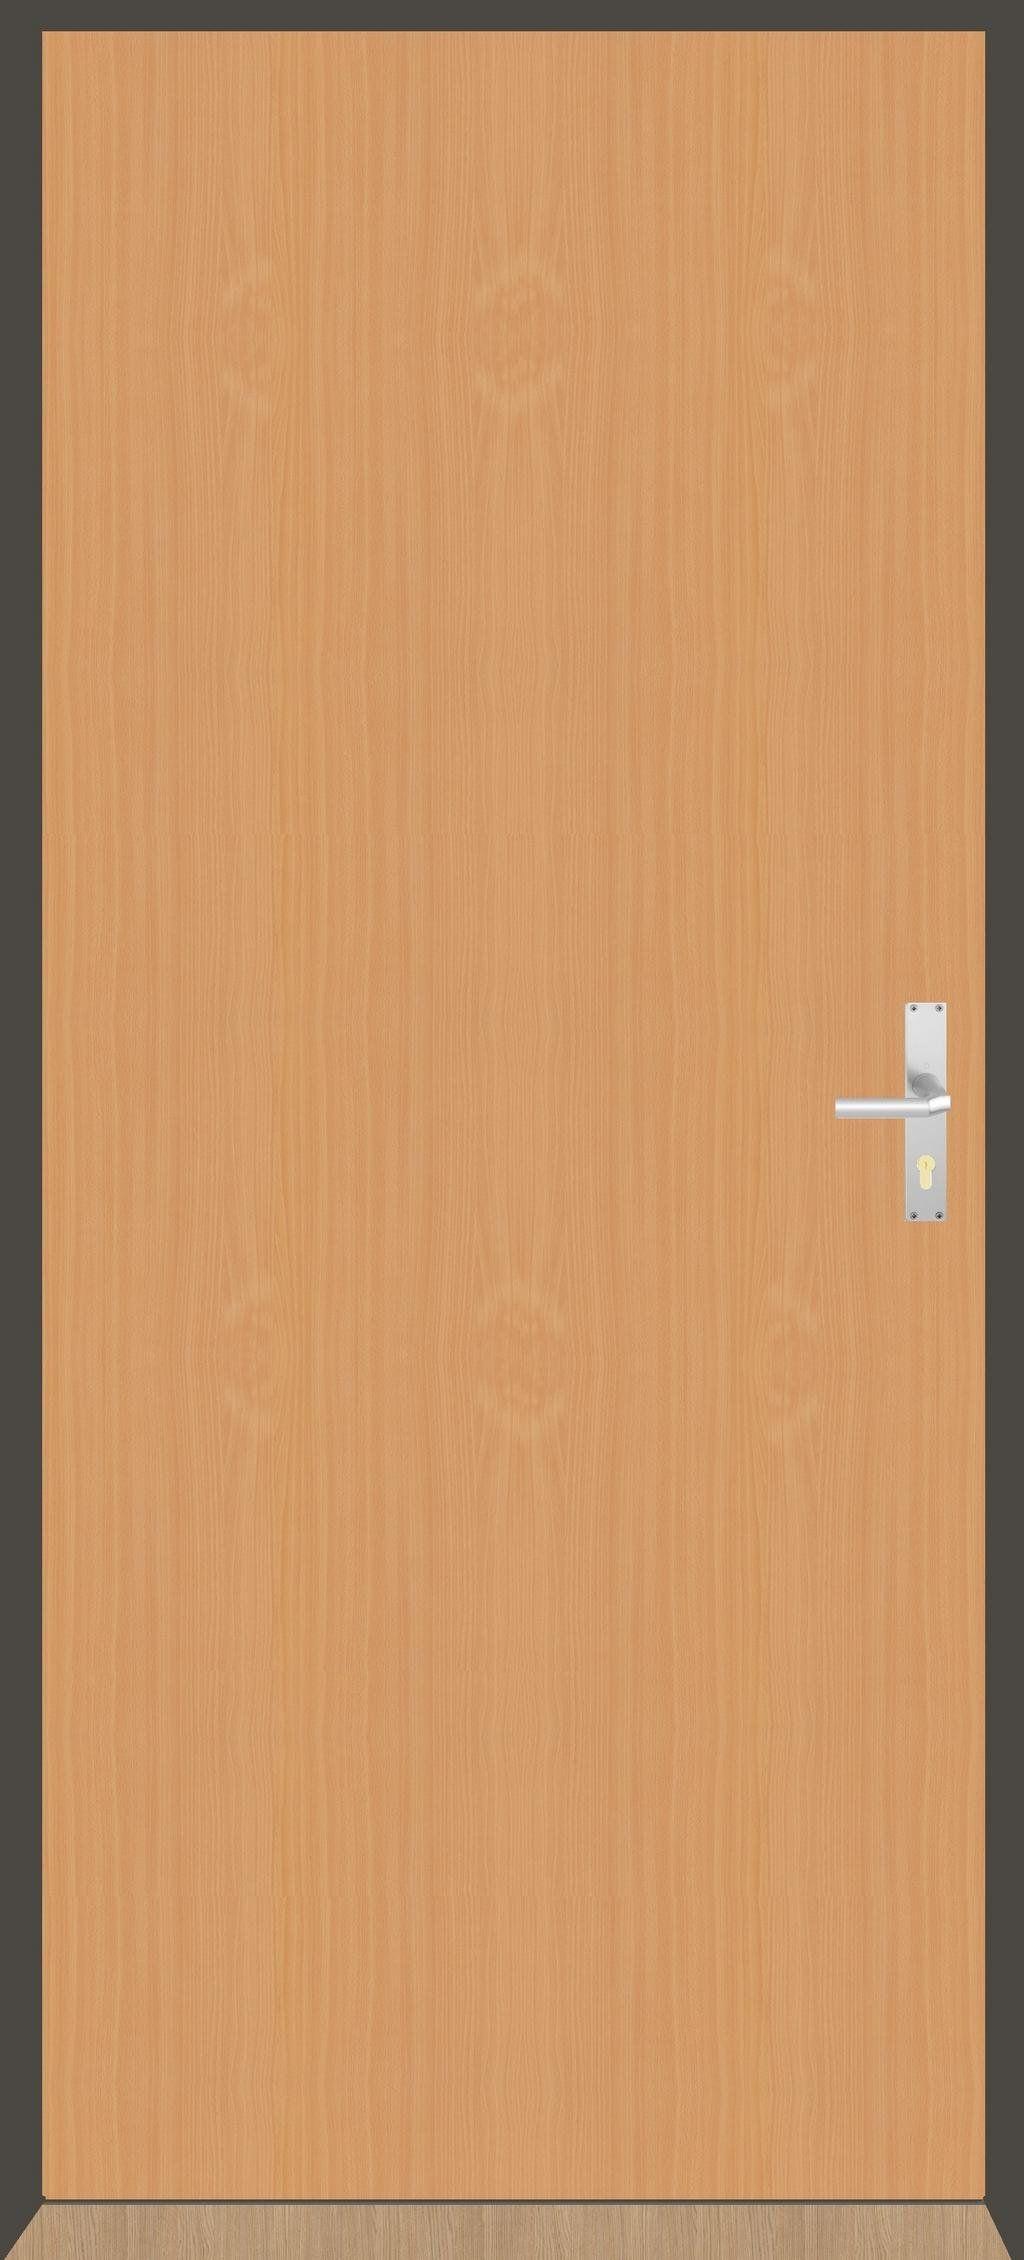 Fire door surface CPL laminate BUK